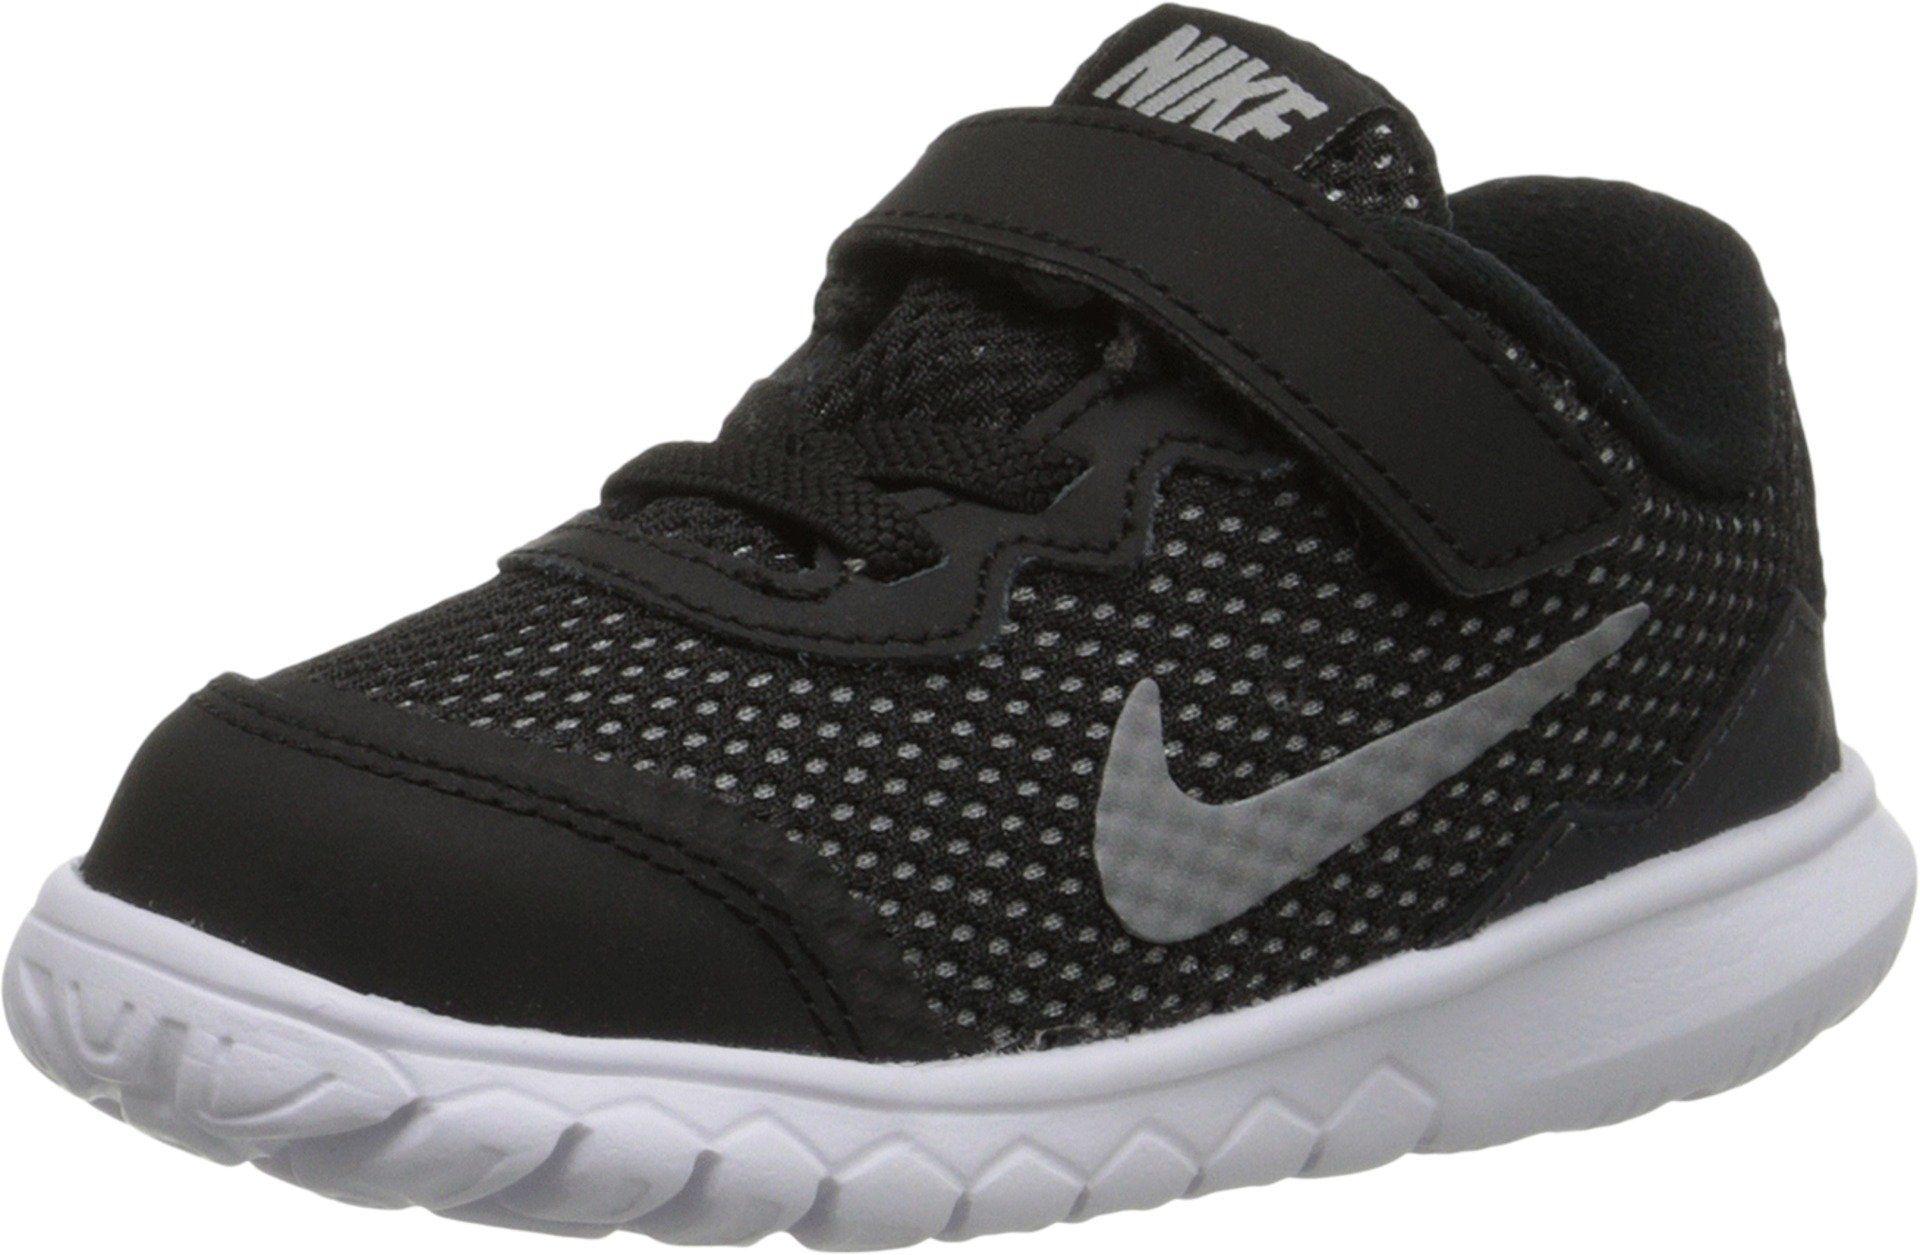 NIKE Baby Boys Flex Experience 4 Athletic Shoe 2 Toddler M US